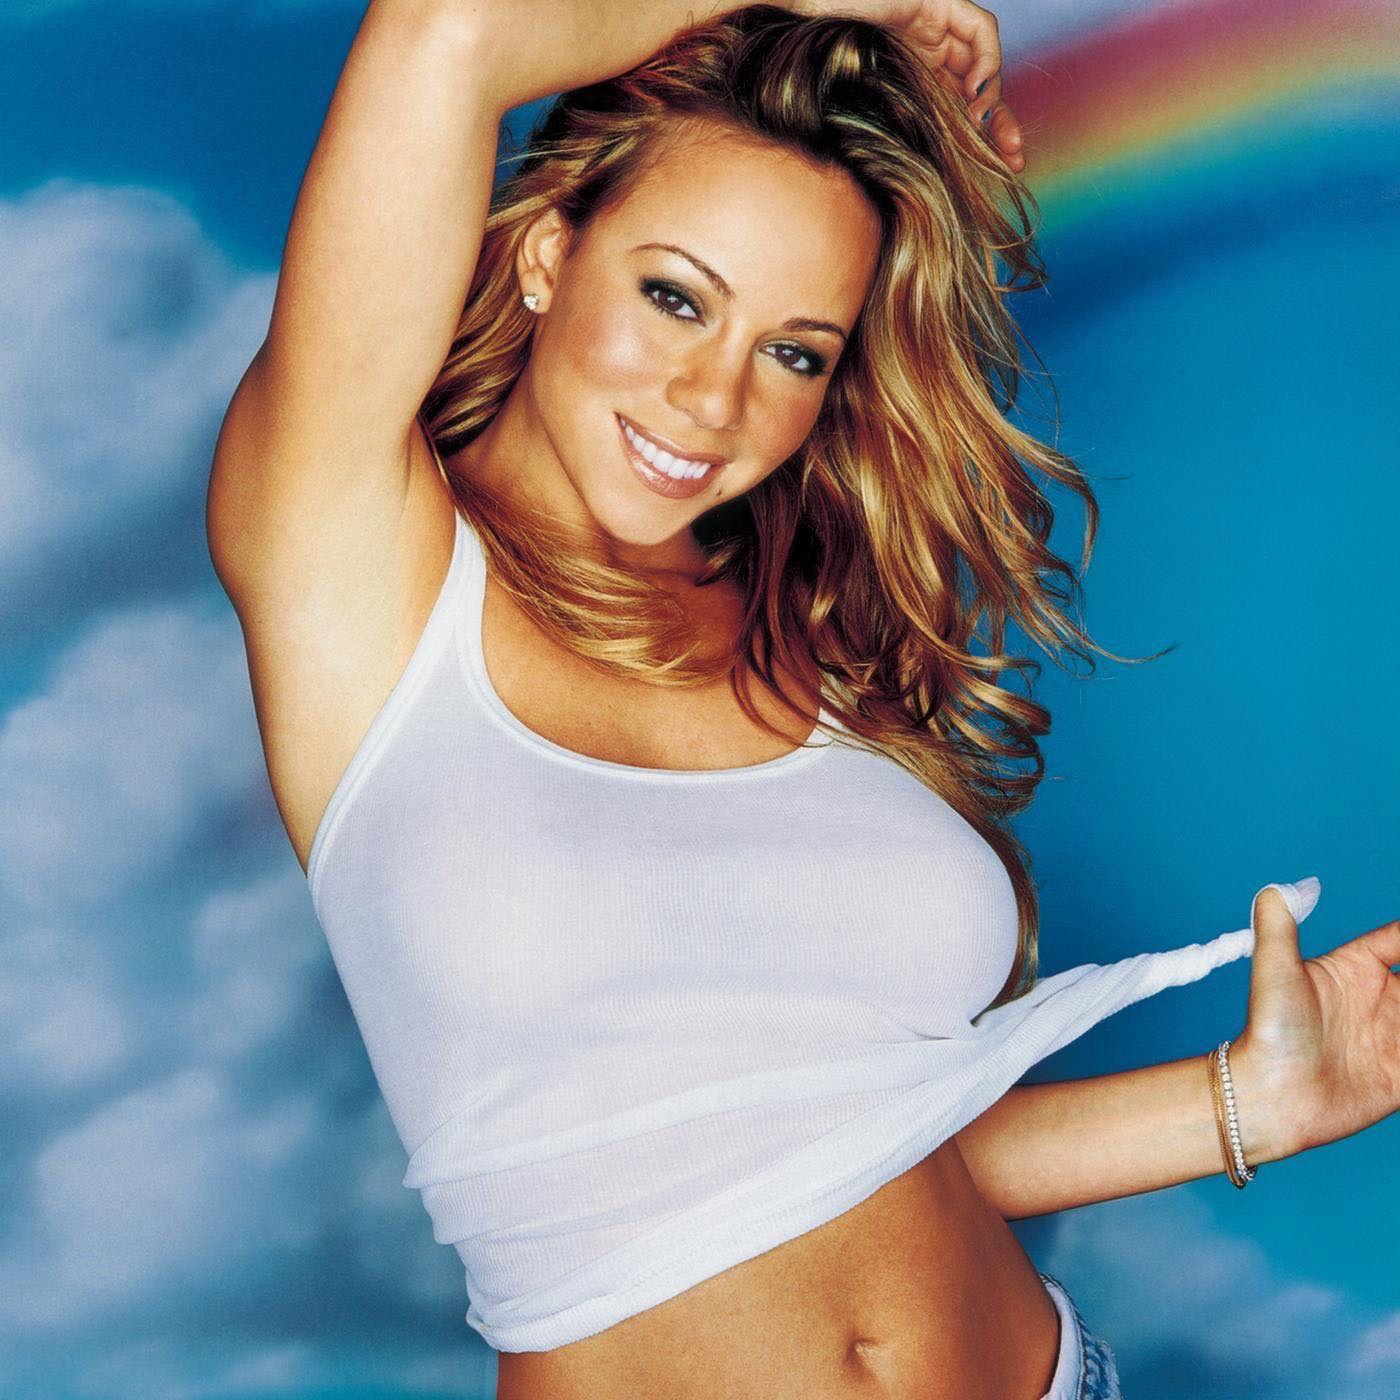 Pin By L O L A On Mariah Carey In 2020 Mariah Carey Mariah